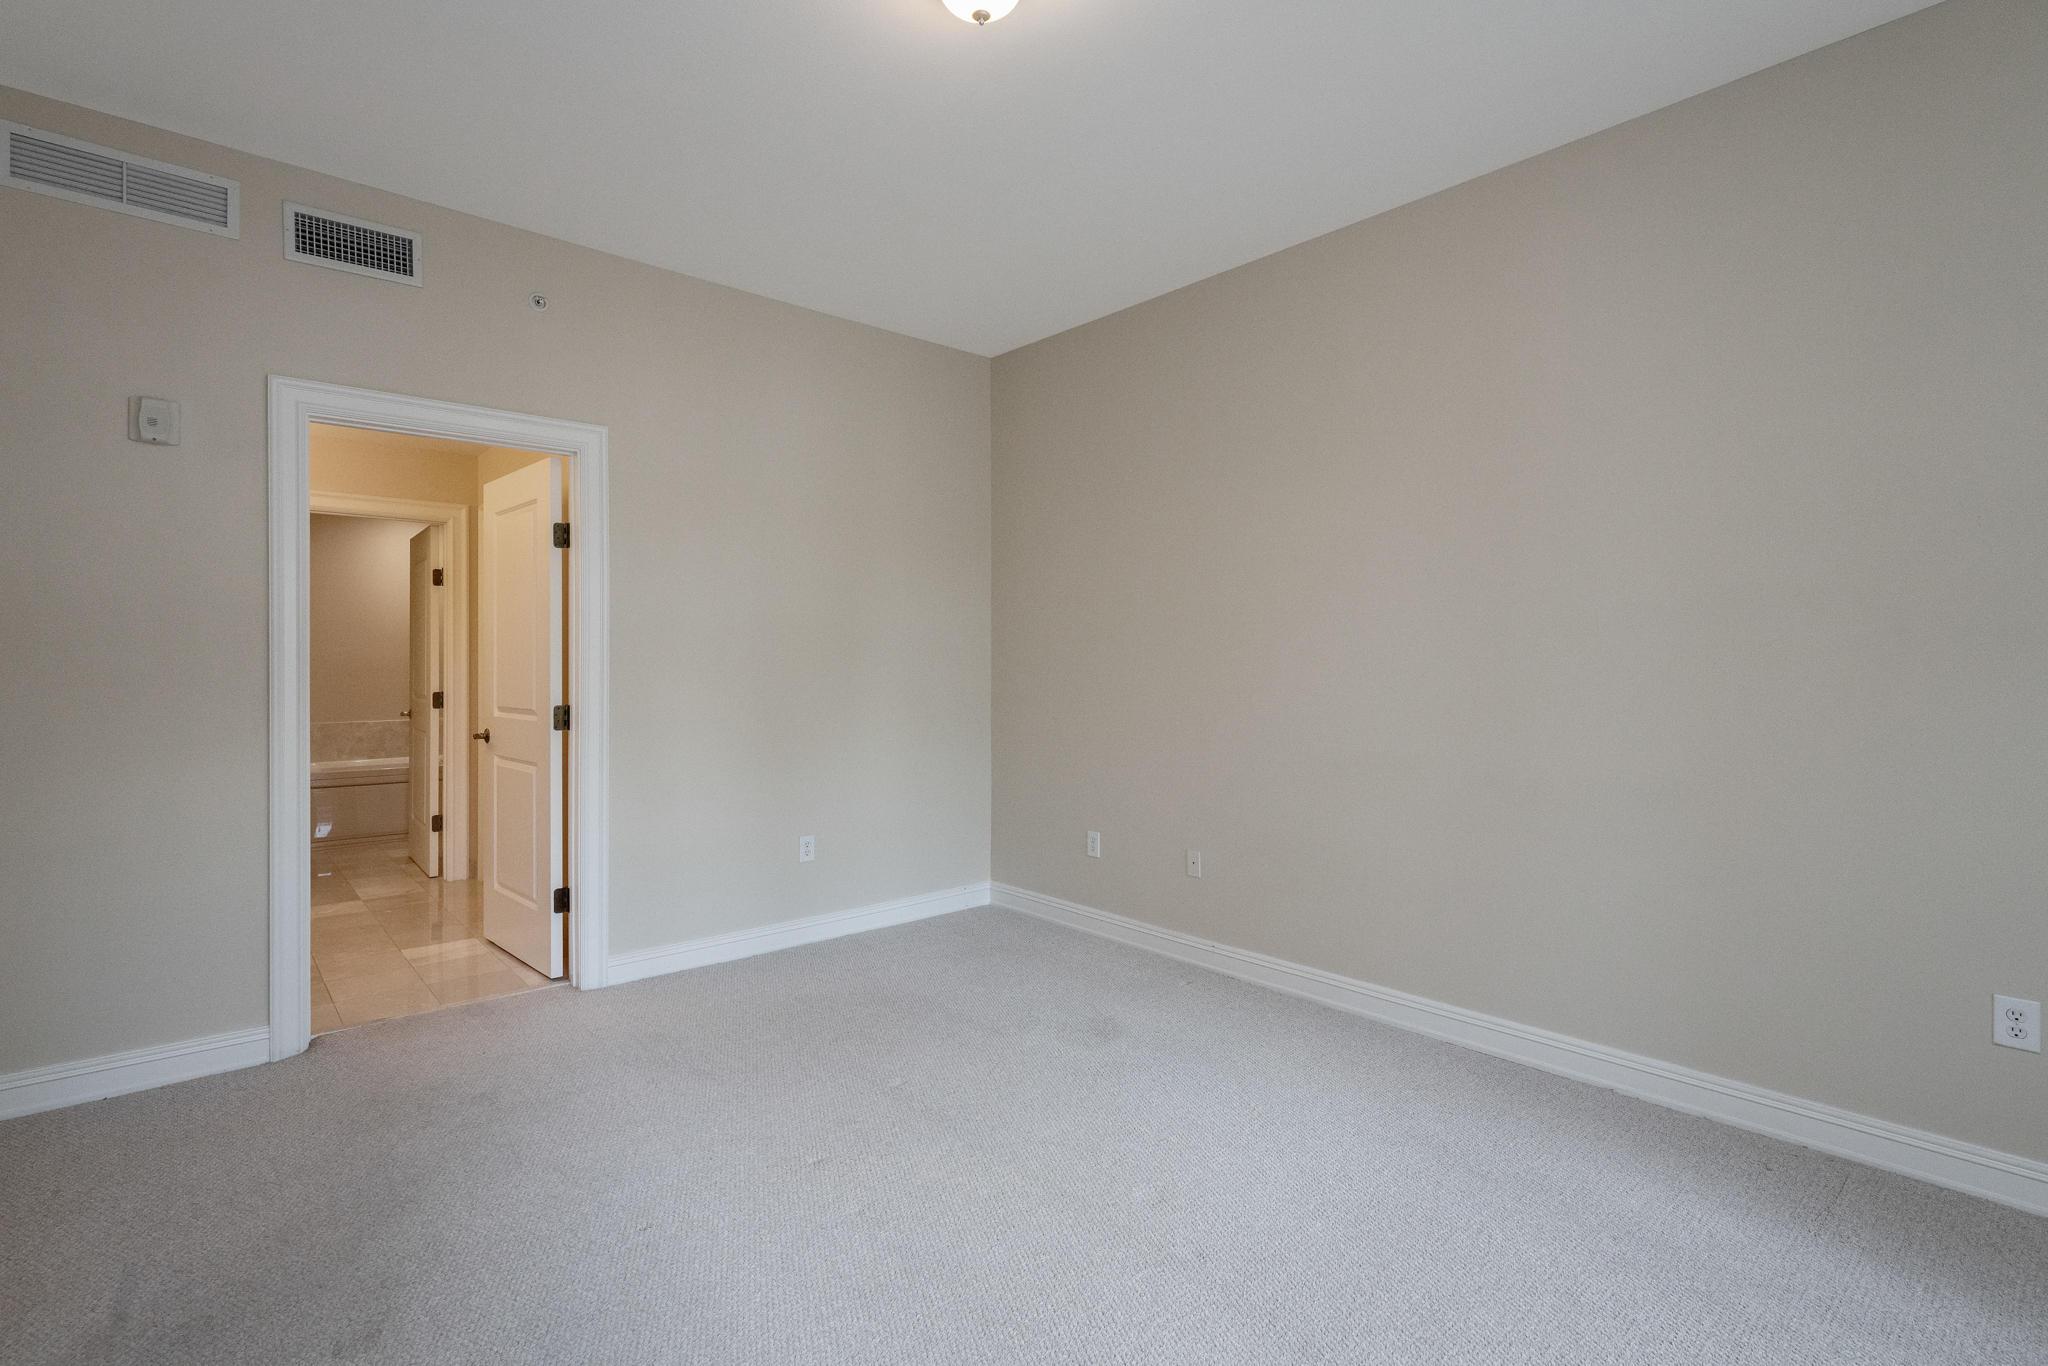 Image 28 For 16100 Emerald Estates Drive 390